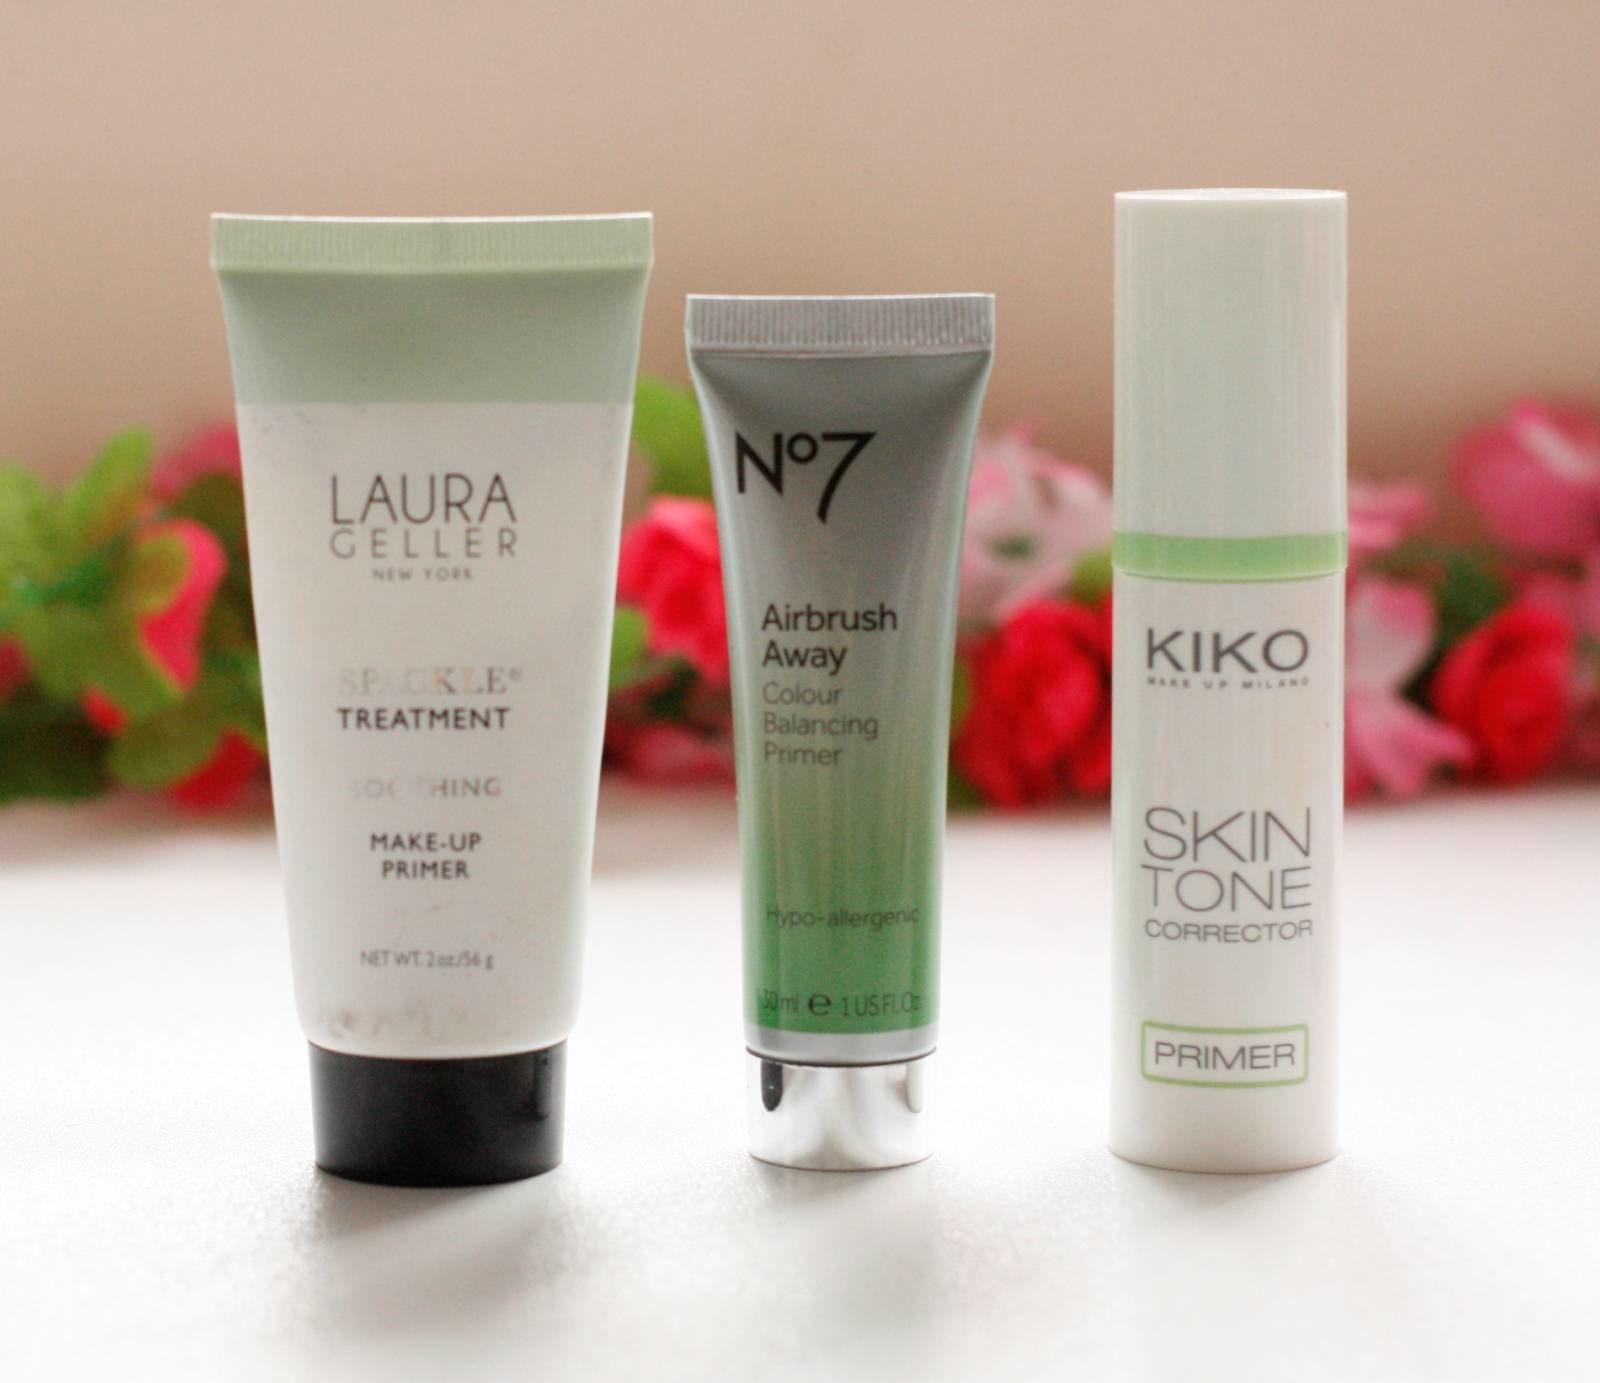 Green Colour Correctors Primers from Laura Geller, No7 and Kiko